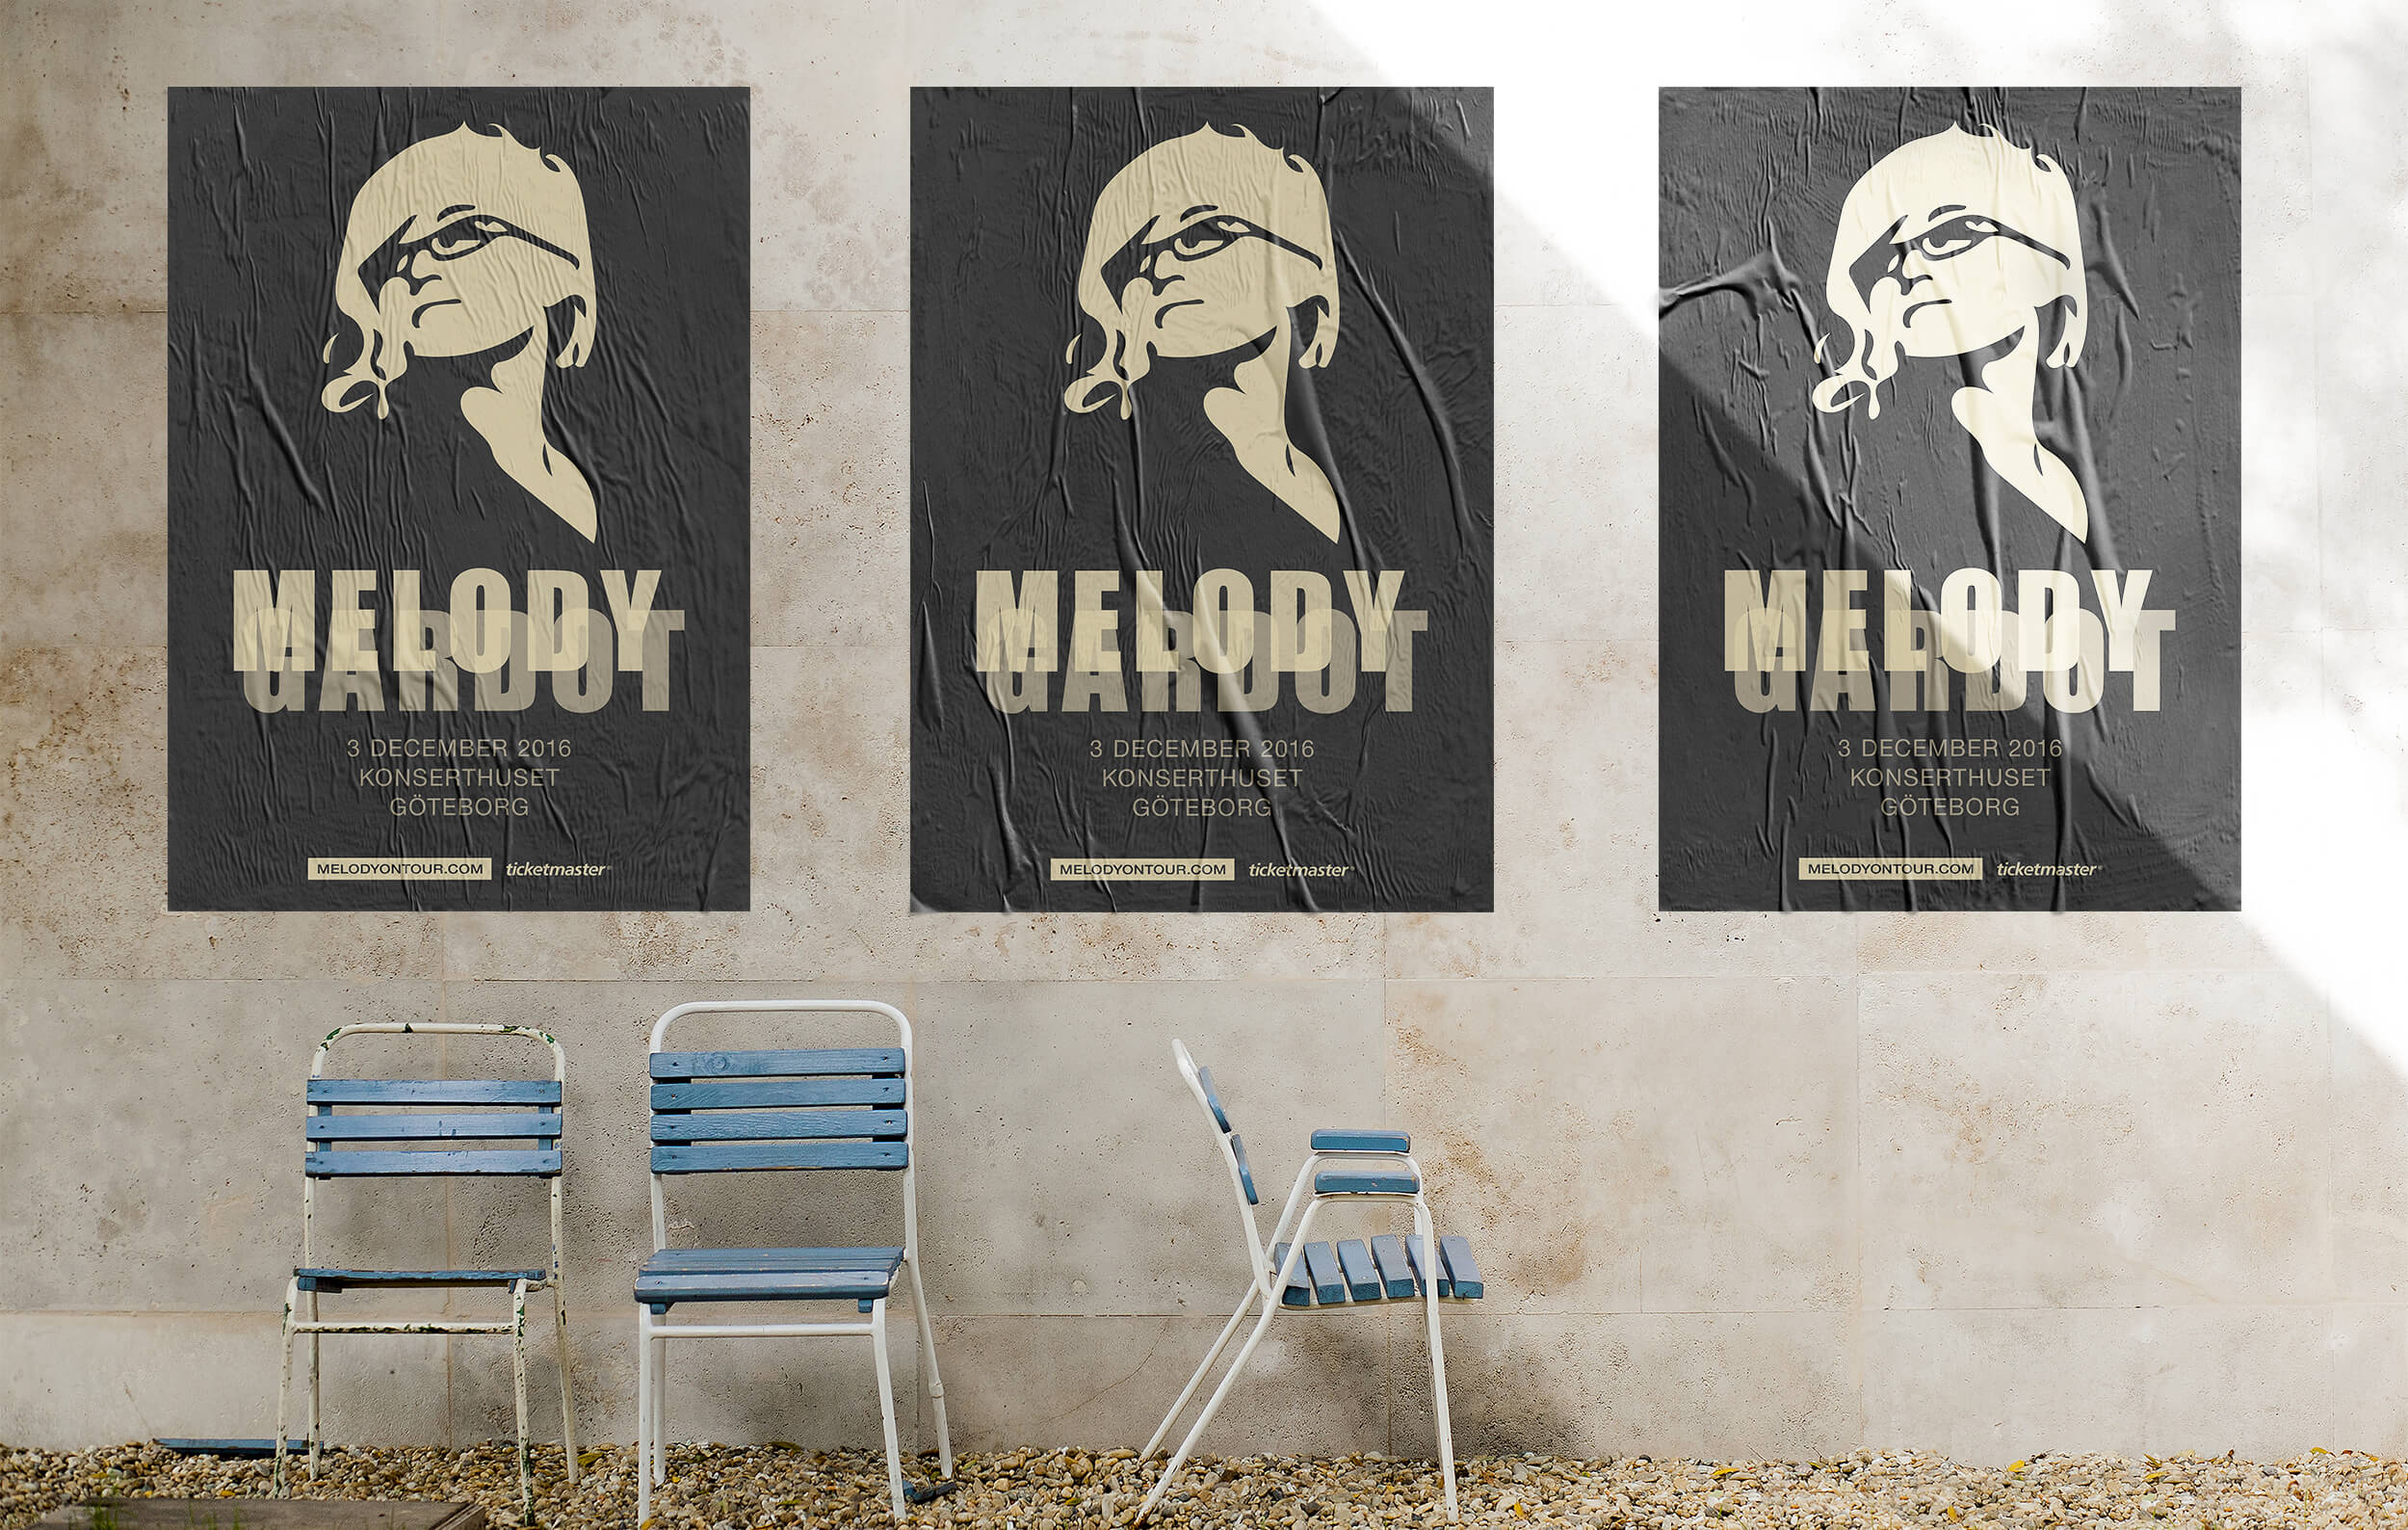 Melody Gardot Poster